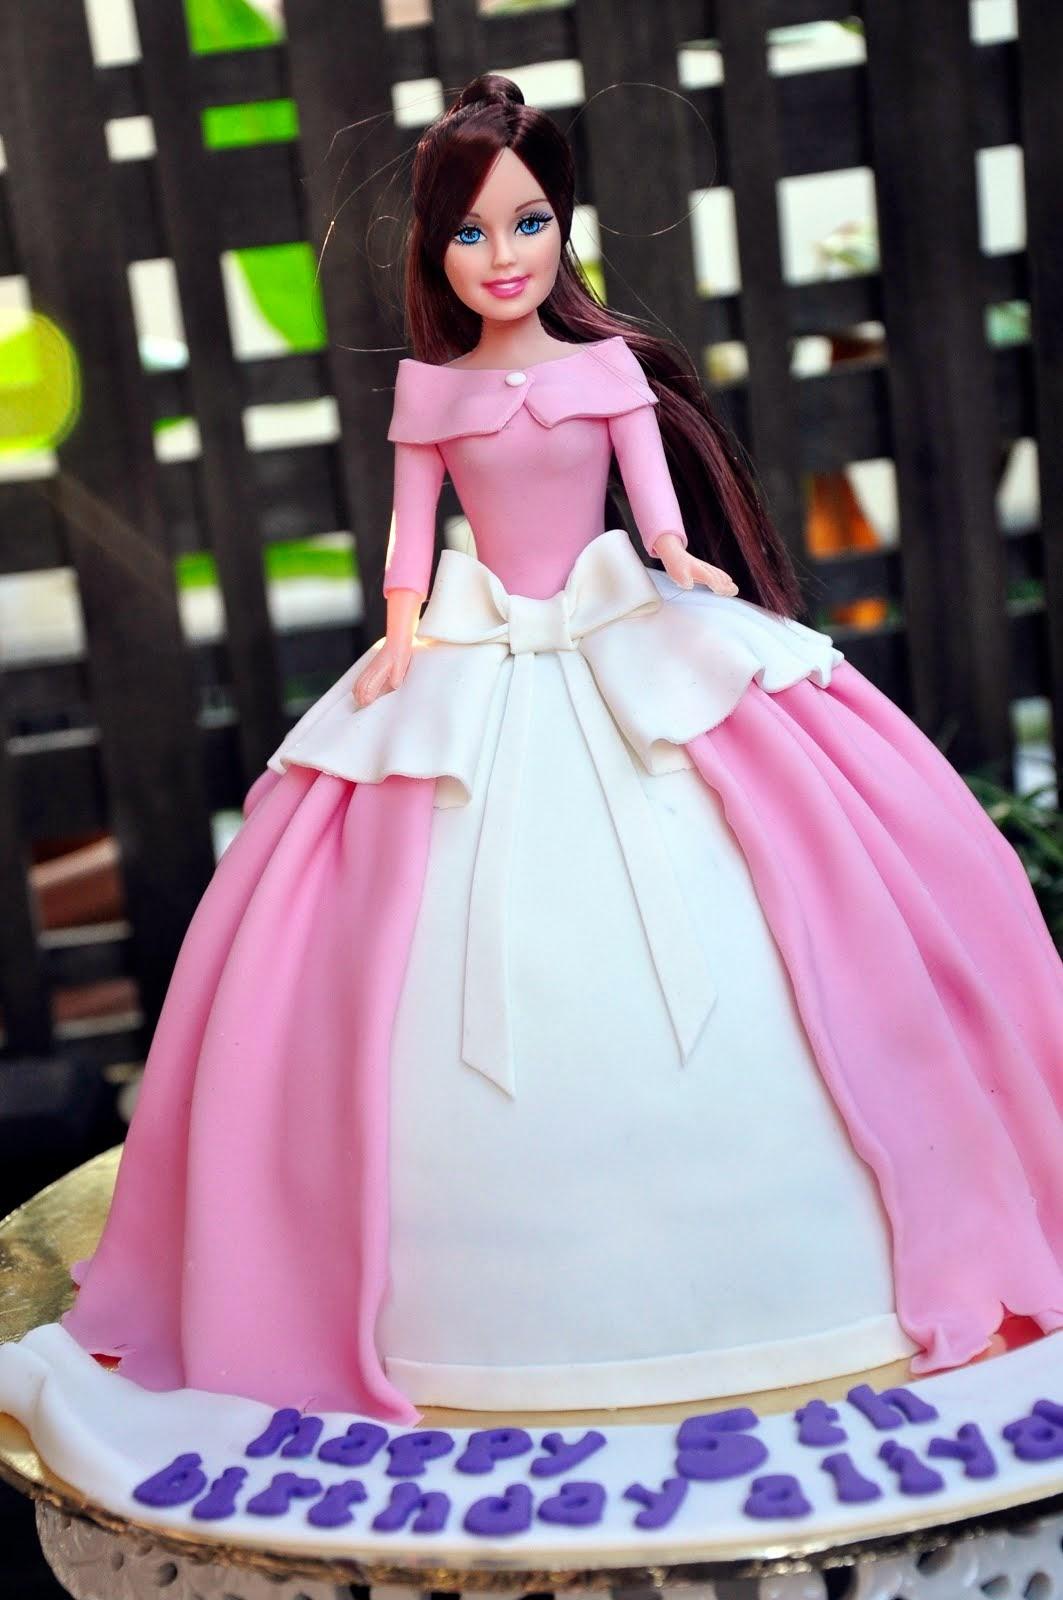 .: Barbie Doll Cake :.